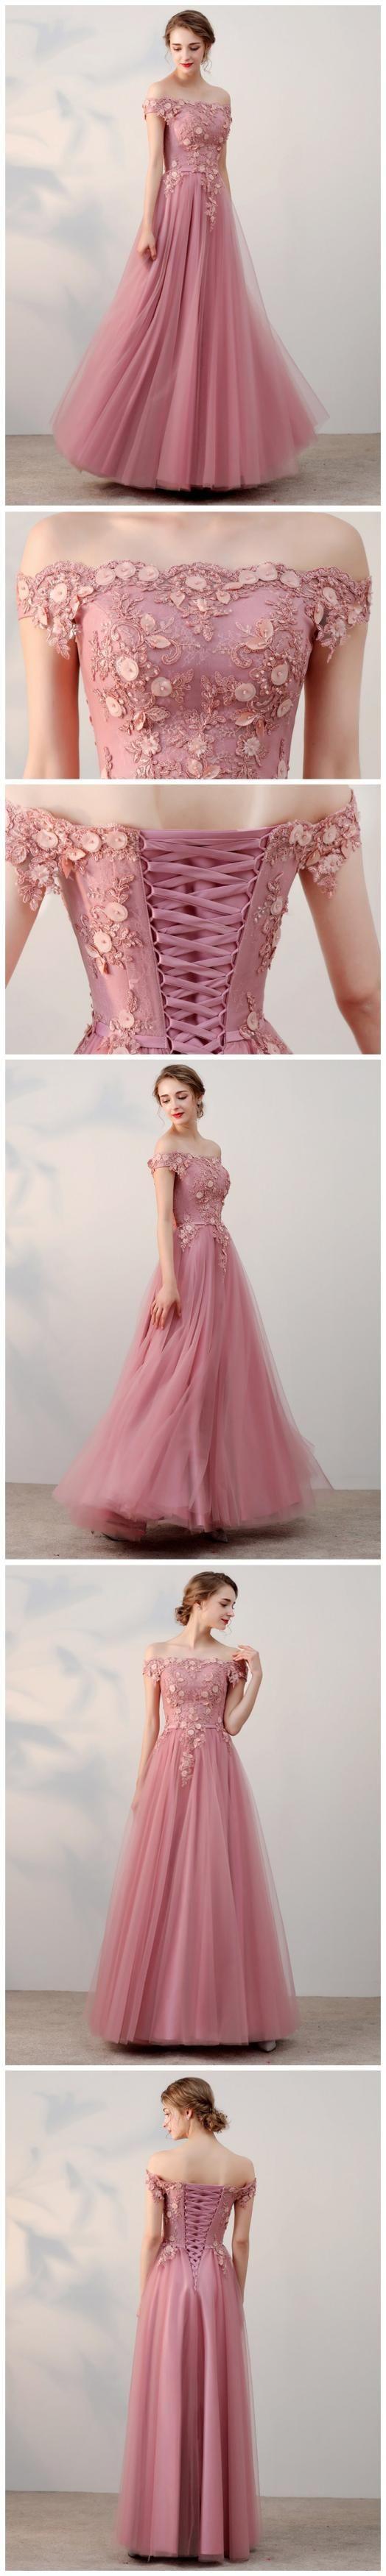 Chic aline offtheshoulder pink applique tulle modest long prom dr